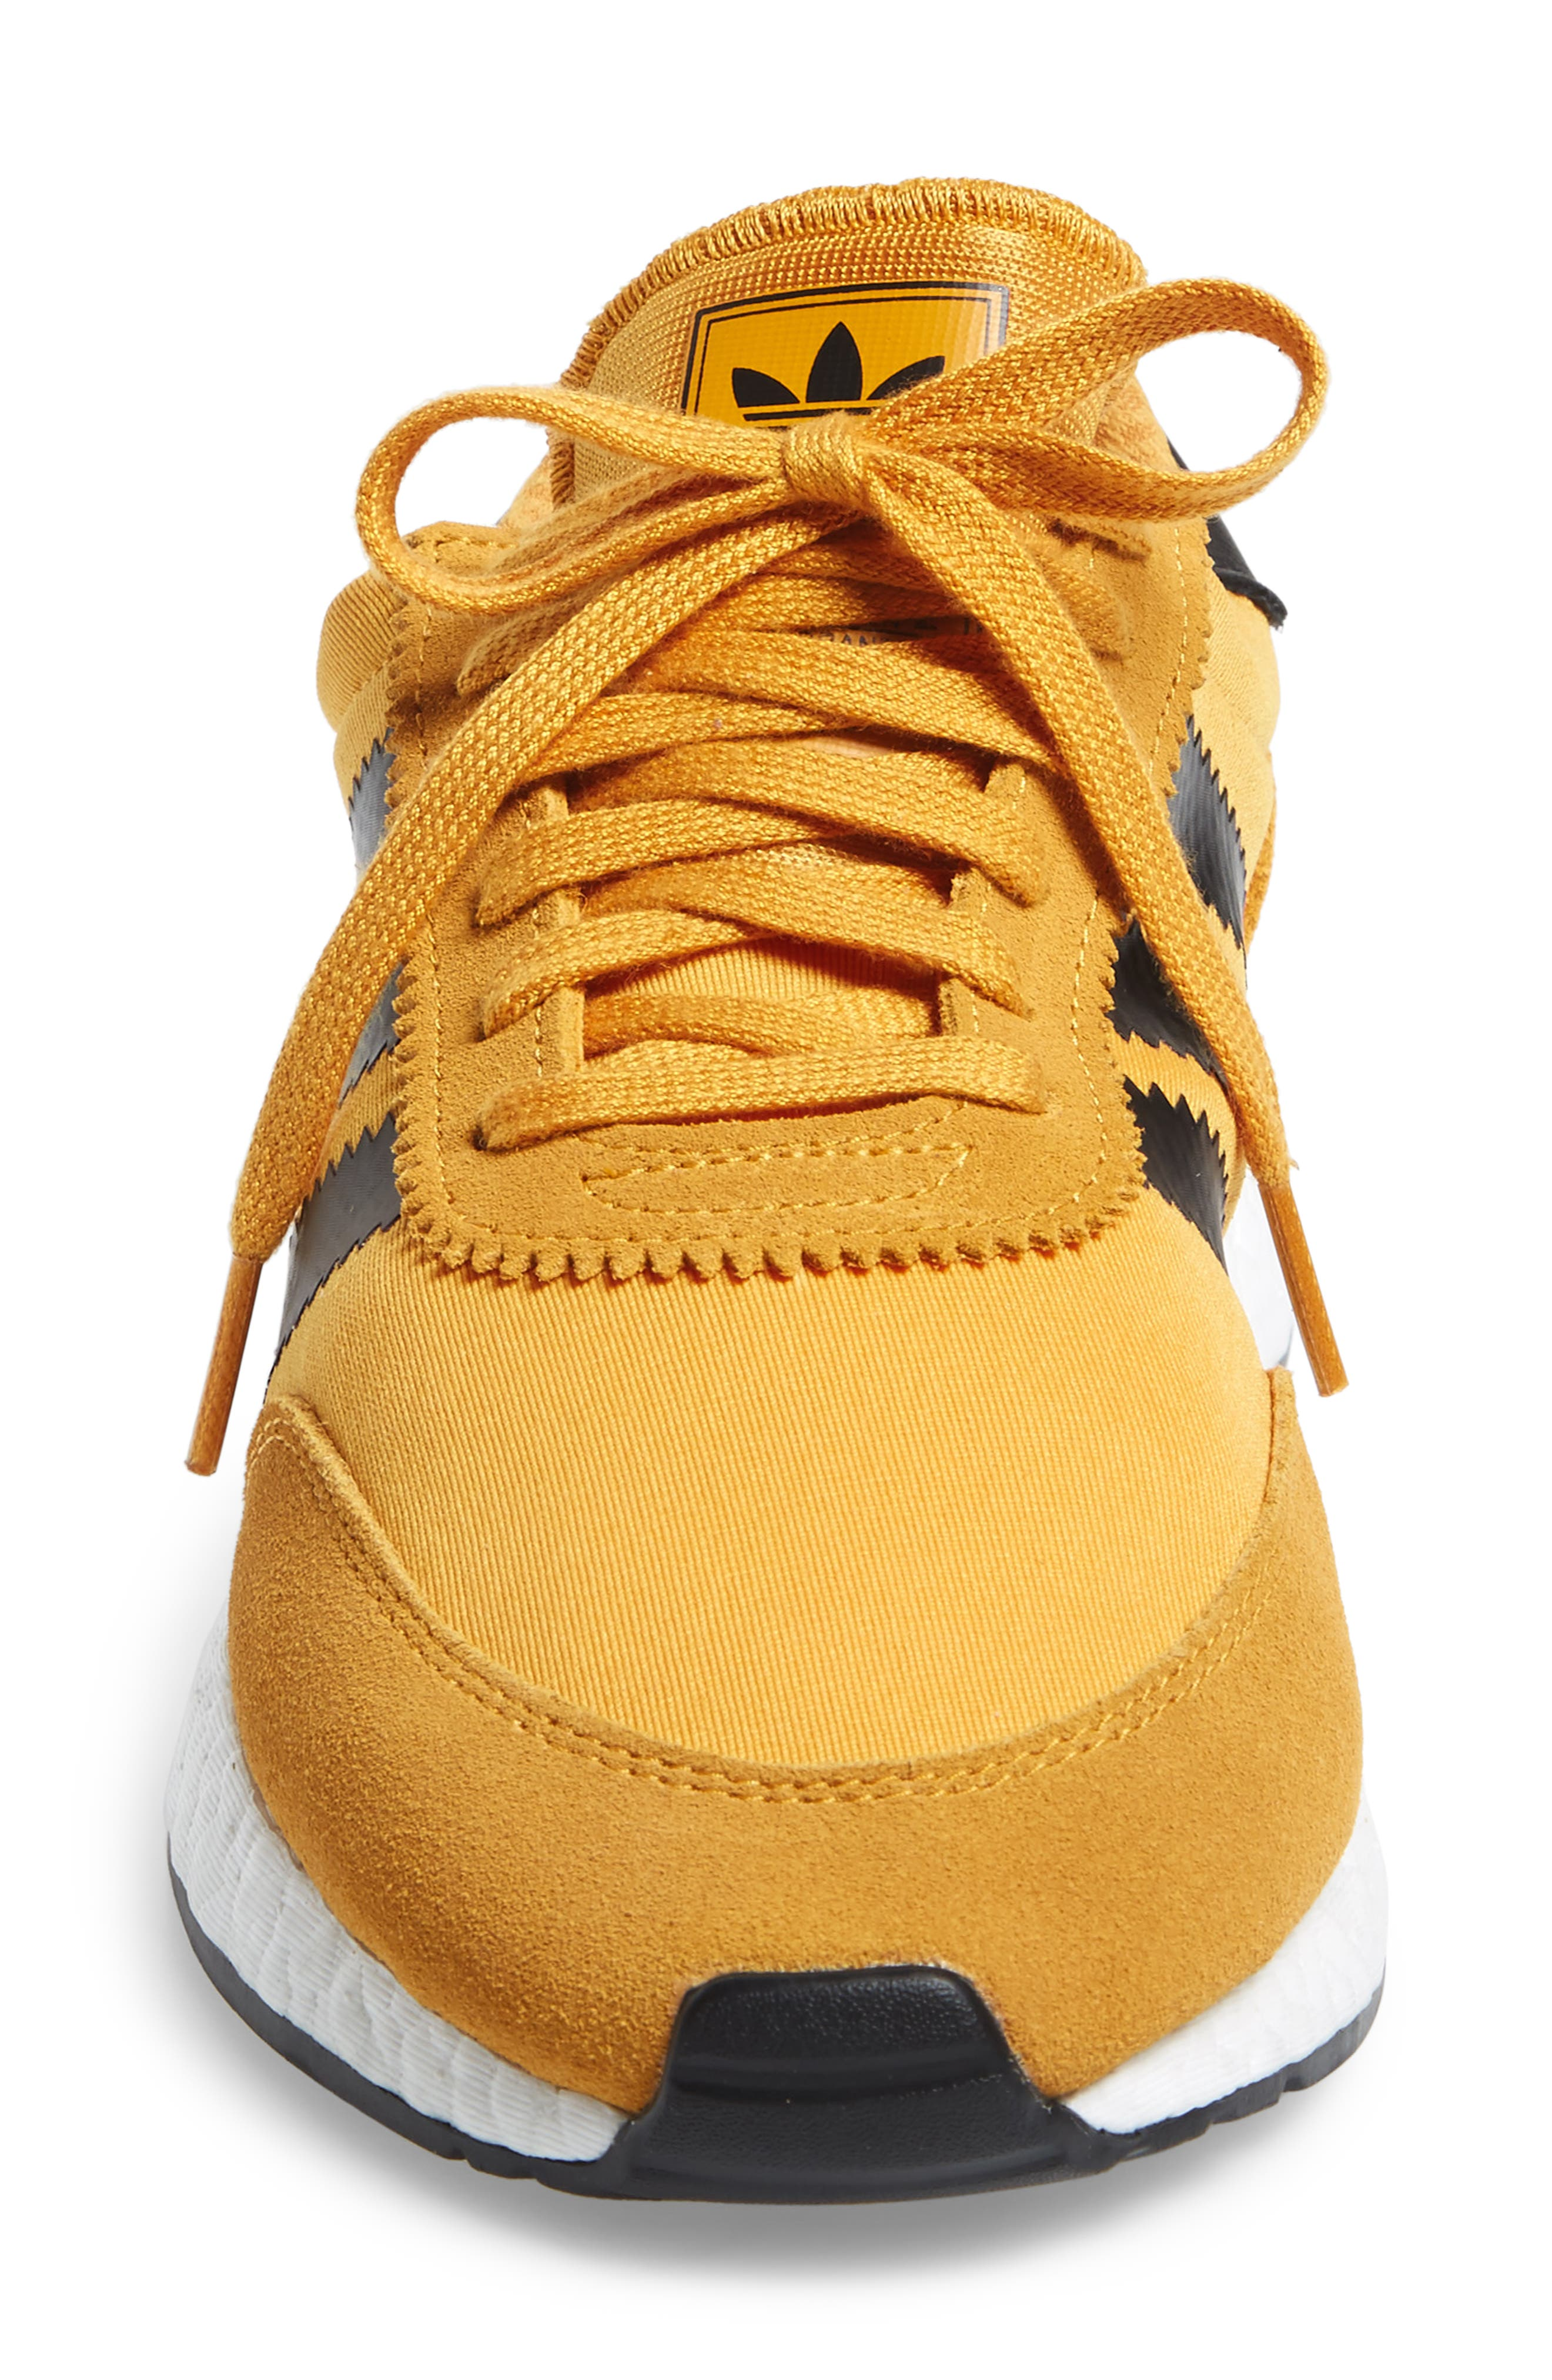 I-5923 Sneaker,                             Alternate thumbnail 4, color,                             Tactile Yellow/ Black/ White